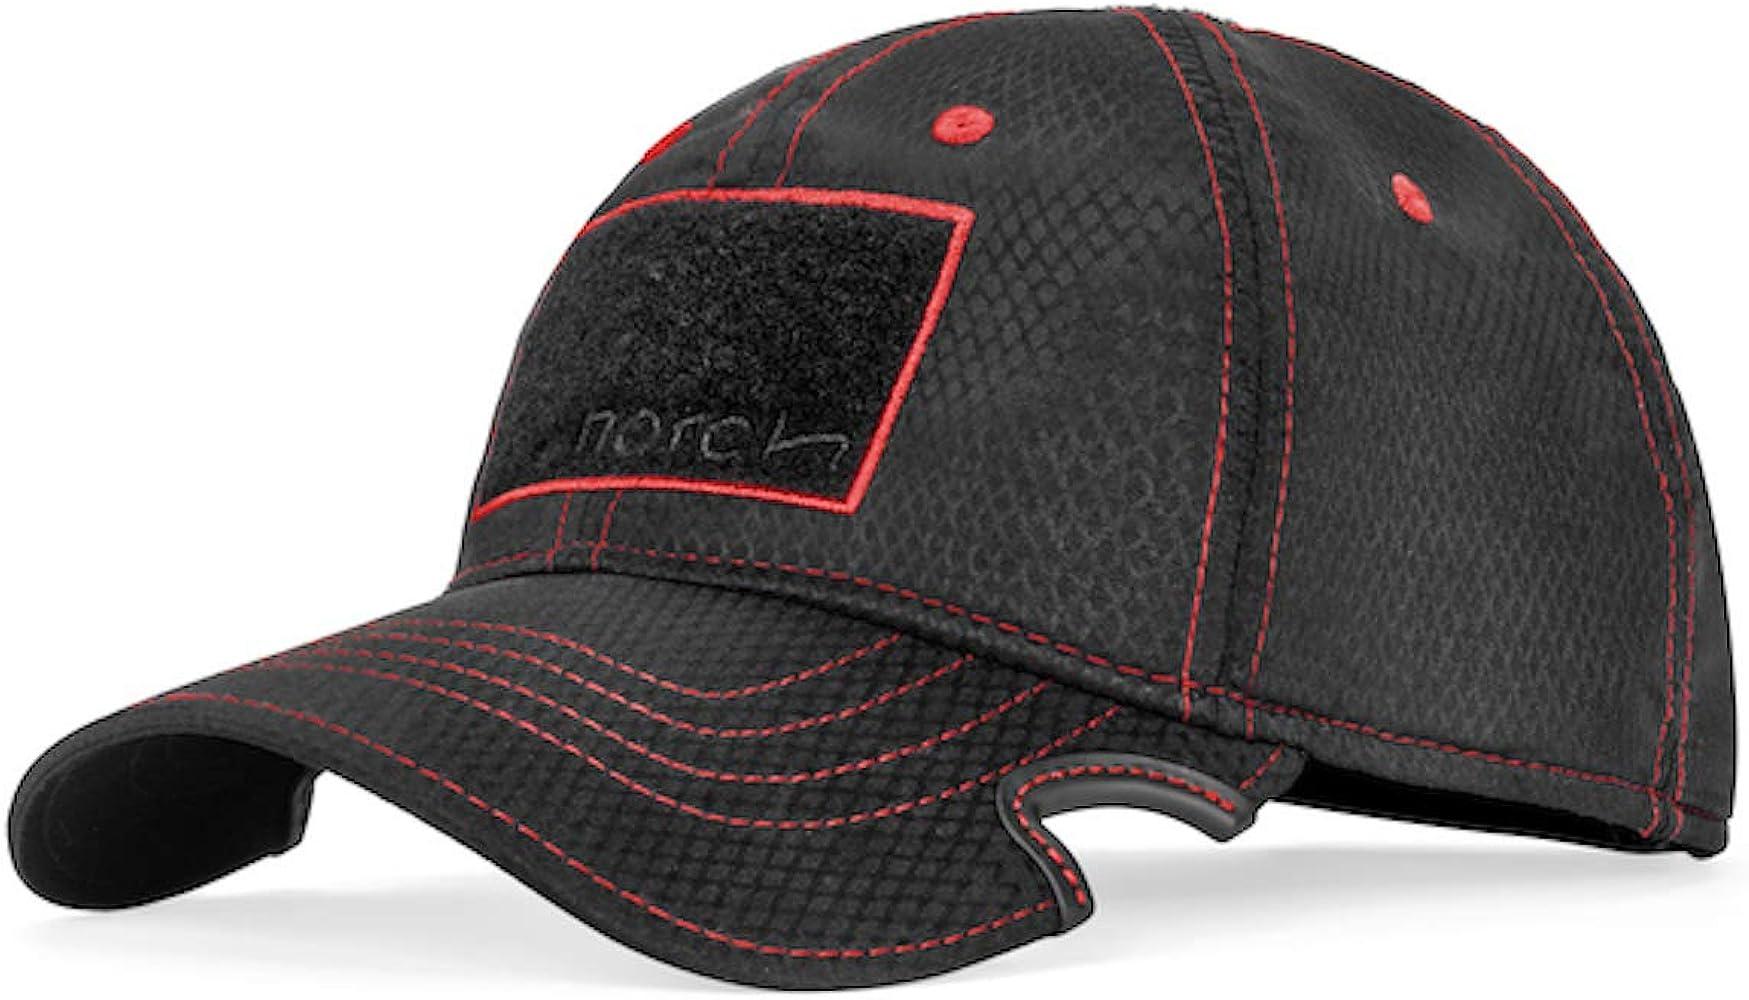 dbe4bf1364b7e5 Notch Classic Adjustable Athlete Operator Black/Red Cap-Men's at ...